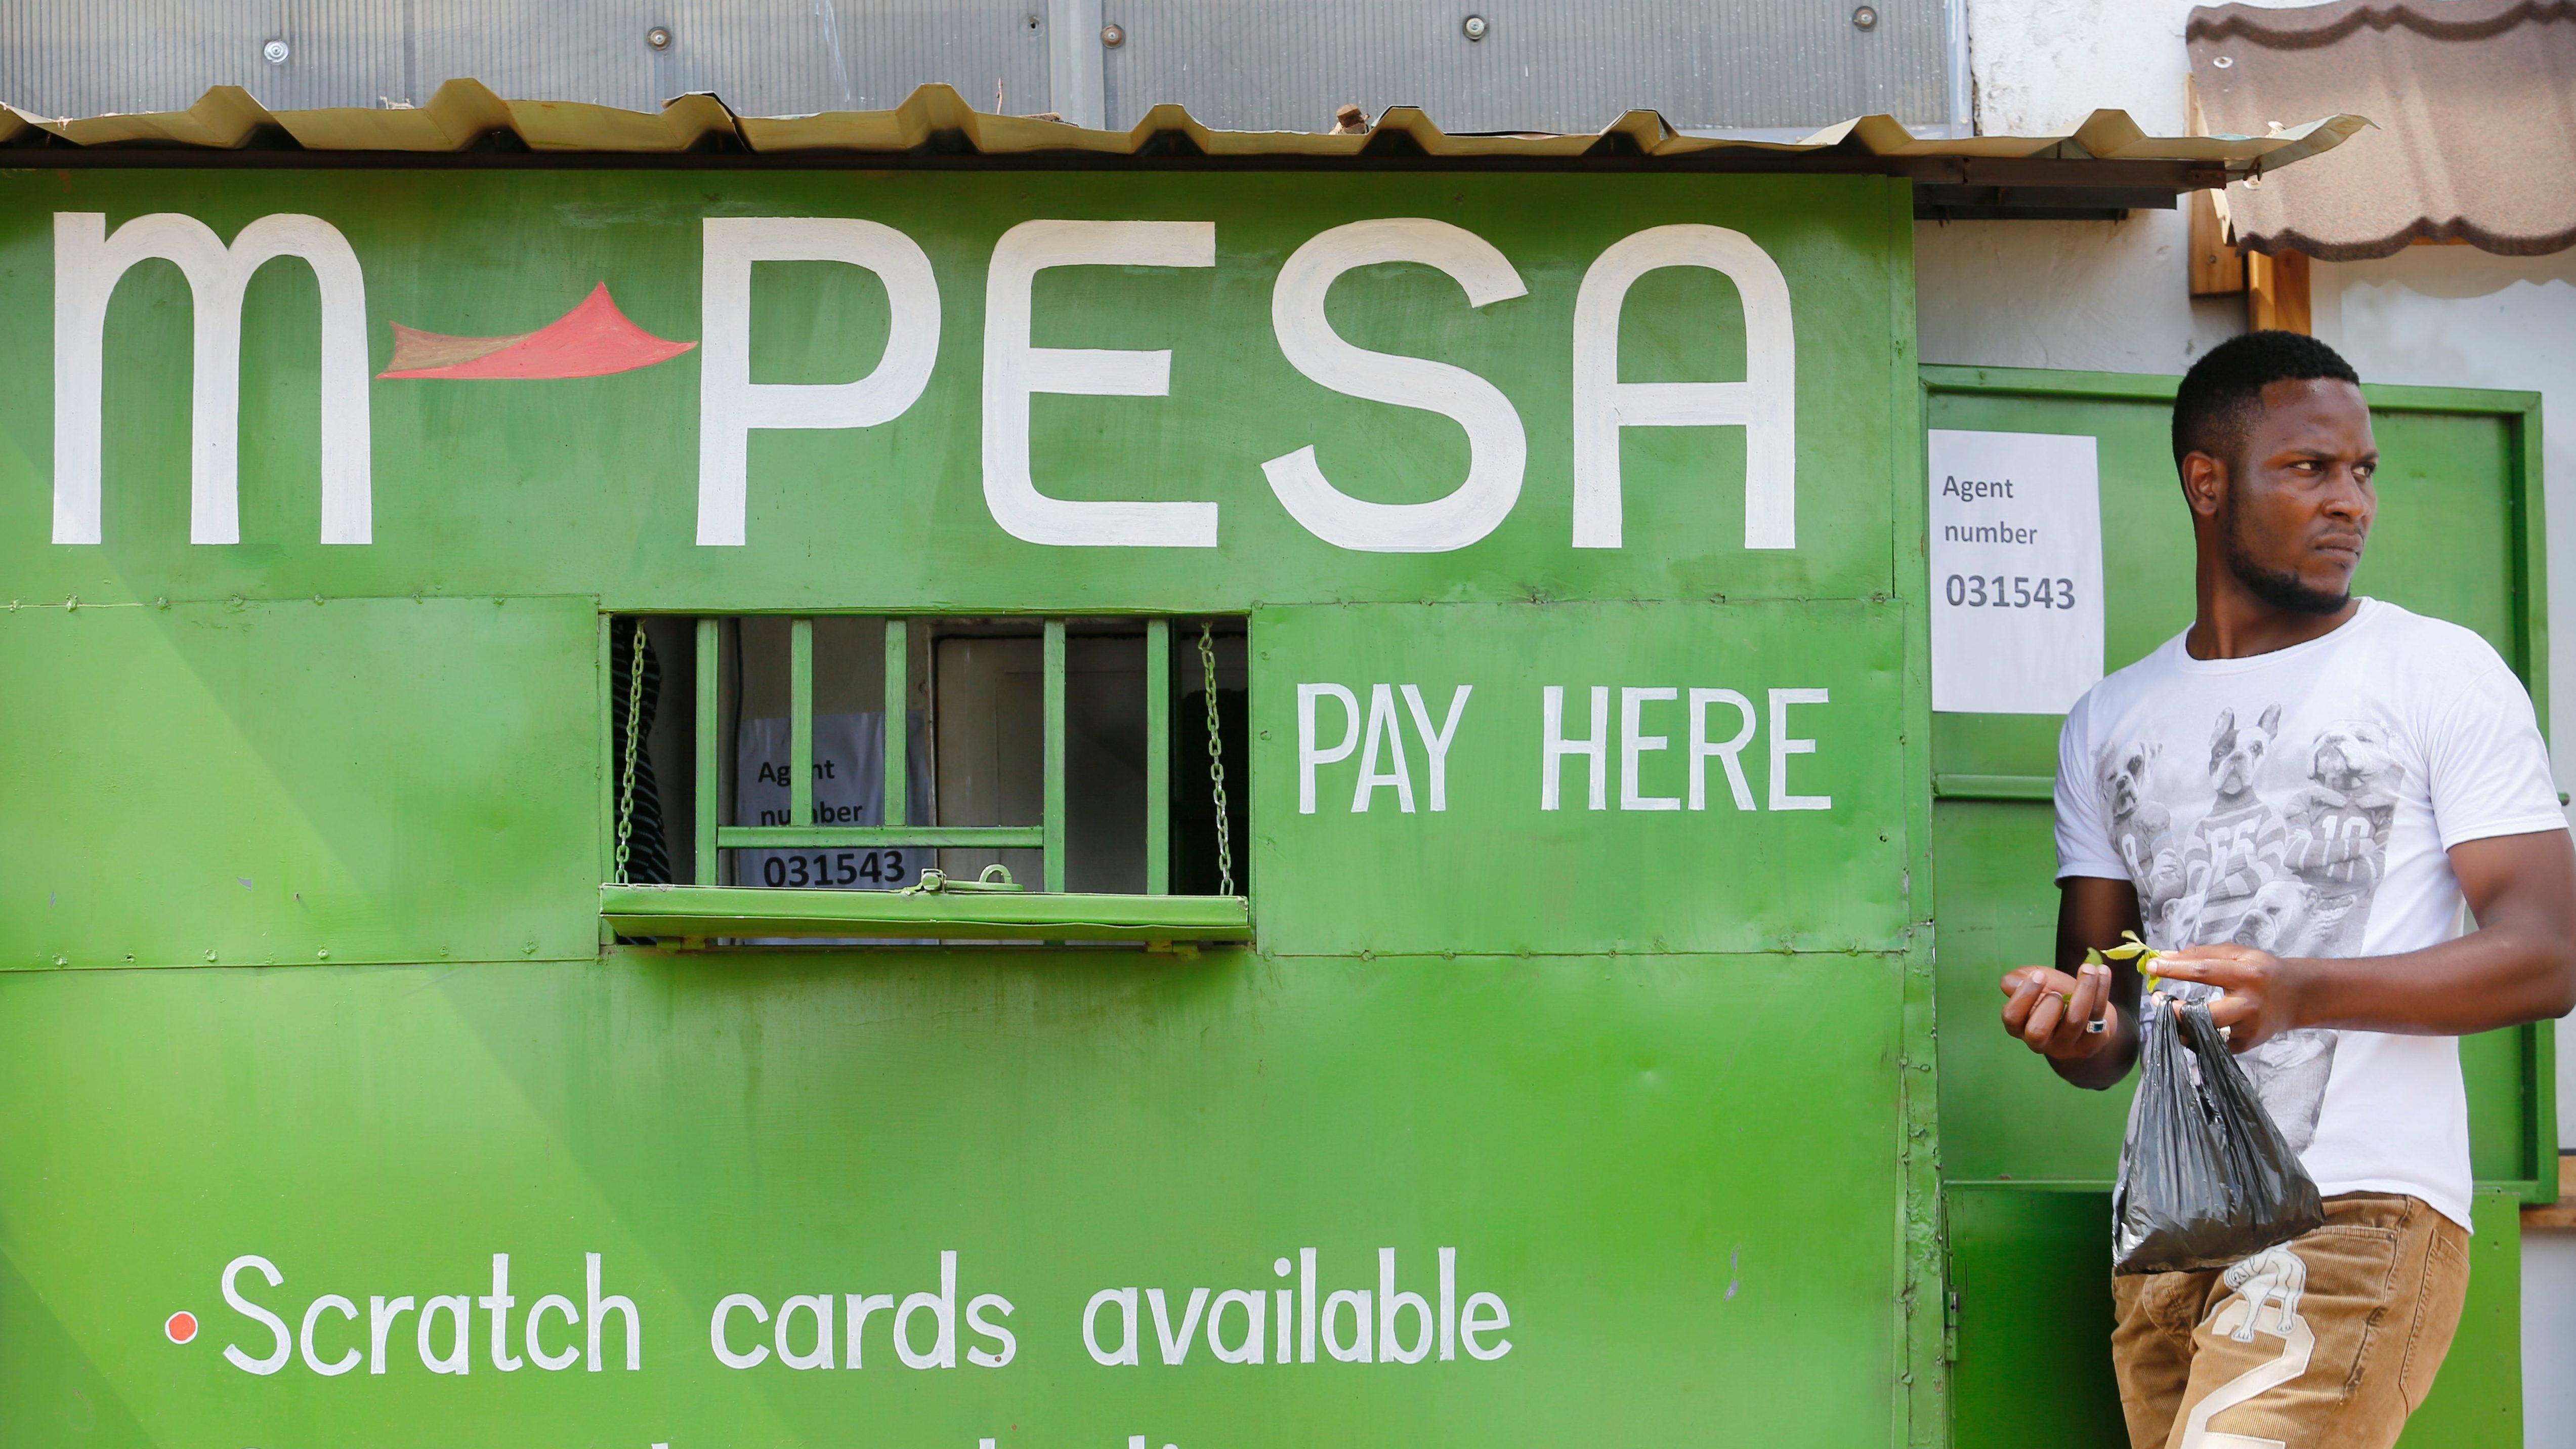 A man stands next to an M-Pesa service outlet in Kibera slum, Nairobi, Kenya, 01 December 2016. M-Pesa is a mobile money transfer platform offered by Kenya's mobile network operator Safaricom.